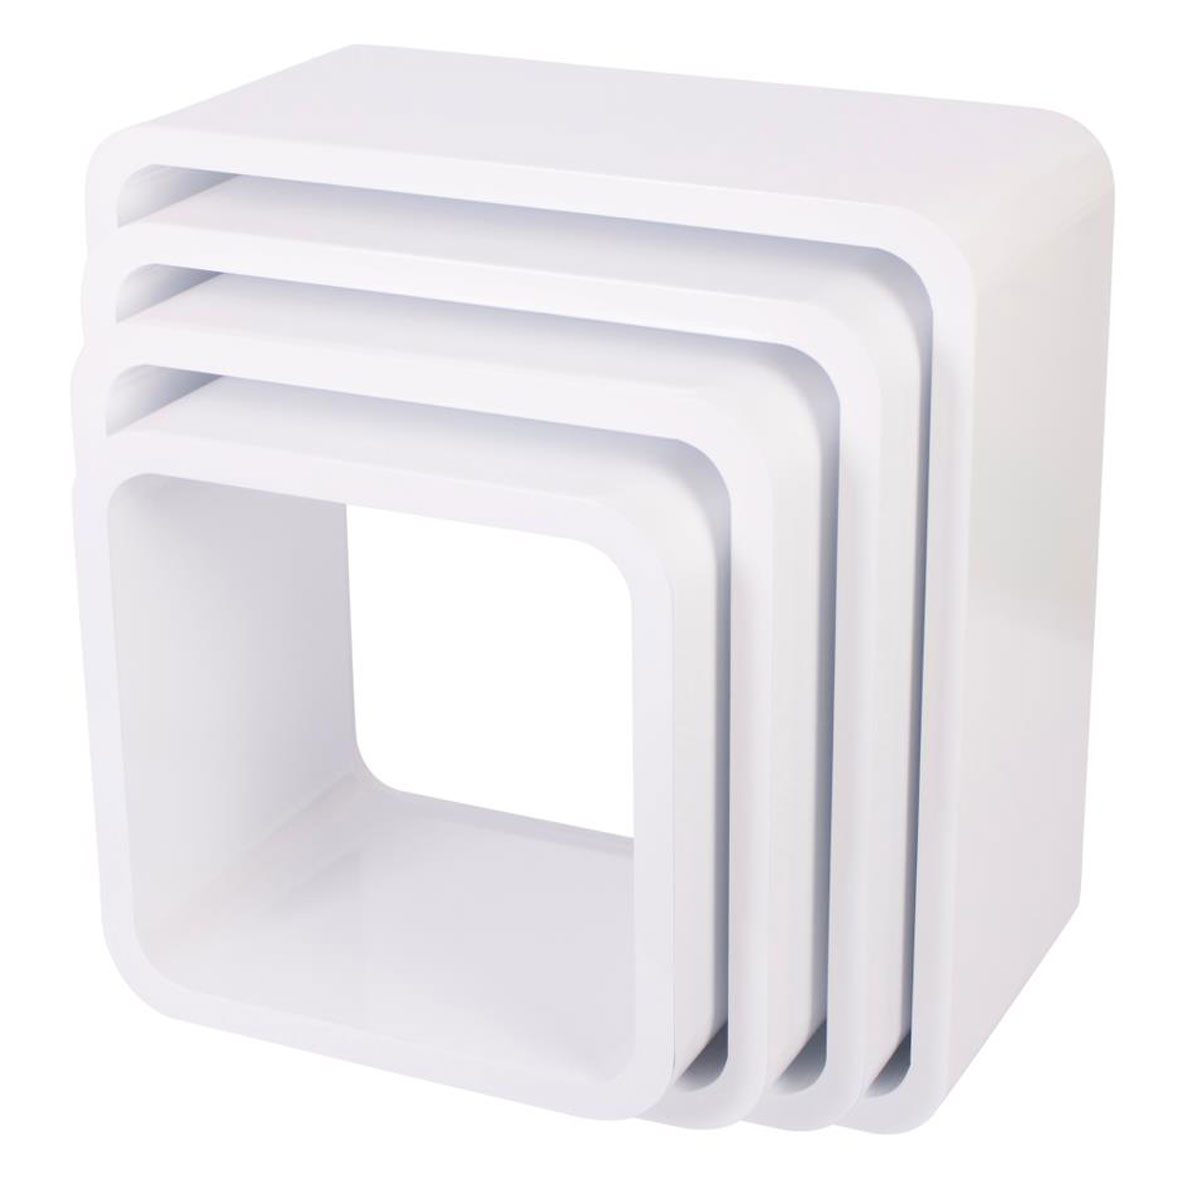 Sebra Cube Regale 4er Set Aus Holz 4009306 Quadratisch